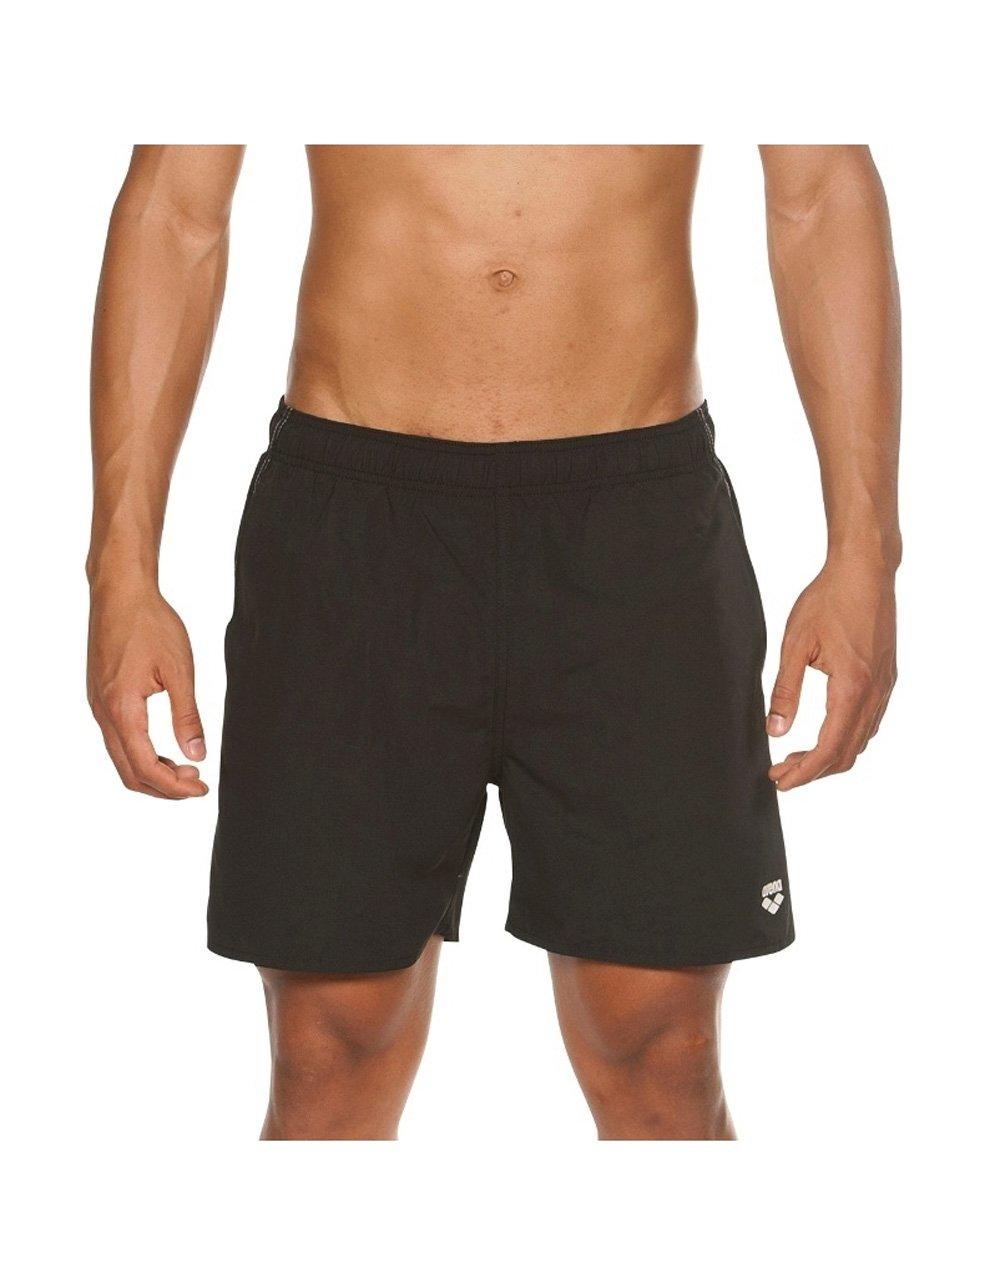 Arena Fundamentals Boxer (1B32851) Black/White